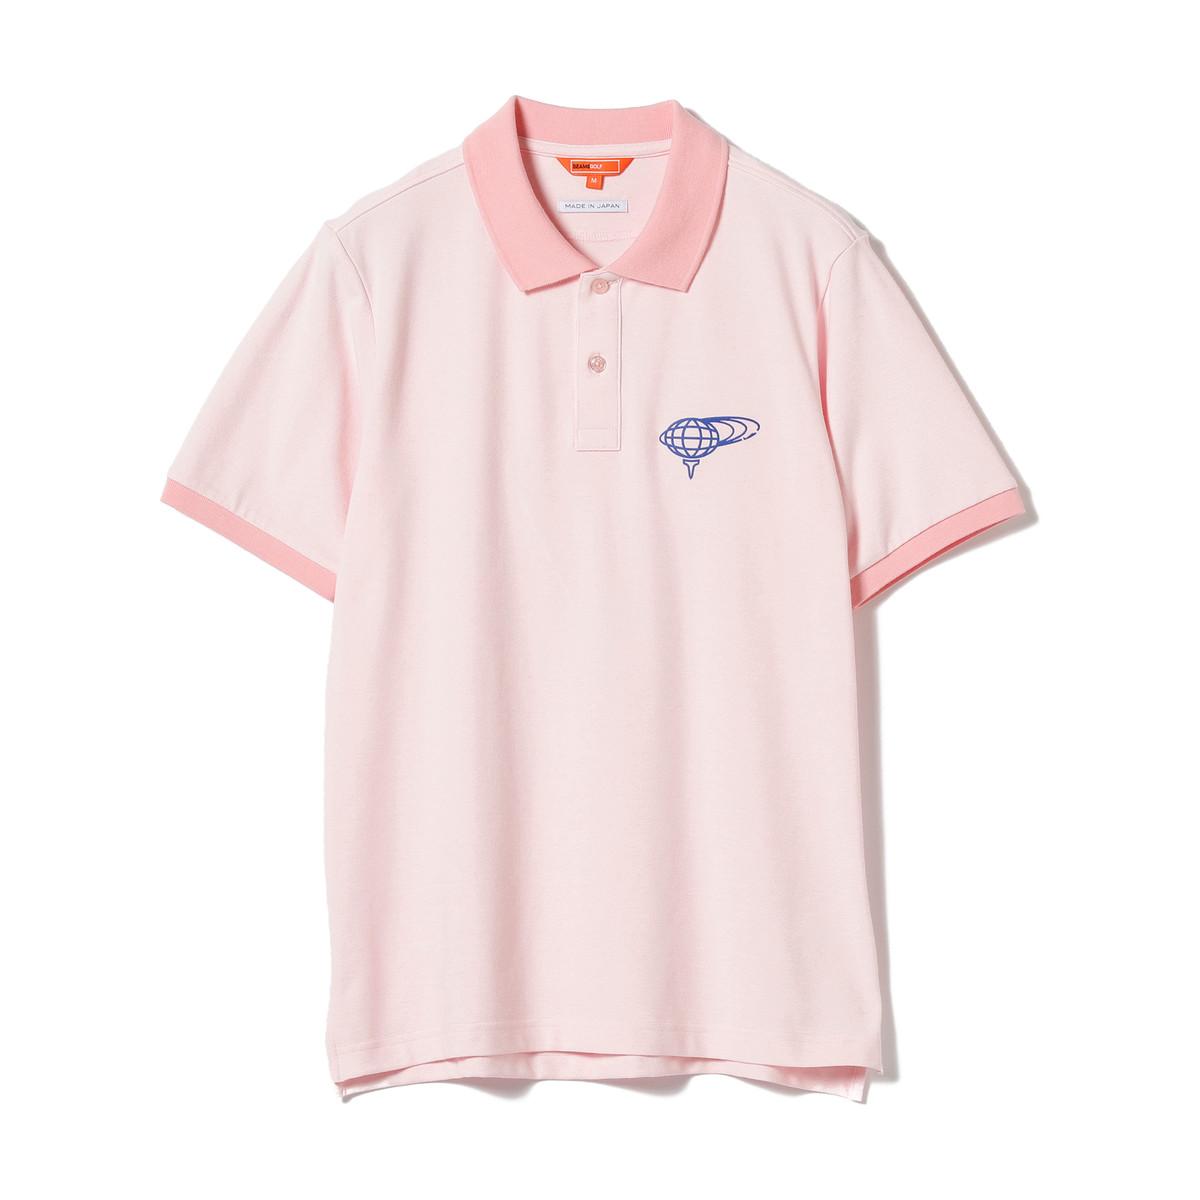 BEAMS GOLF ORANGE LABEL カラー 半袖ポロシャツ